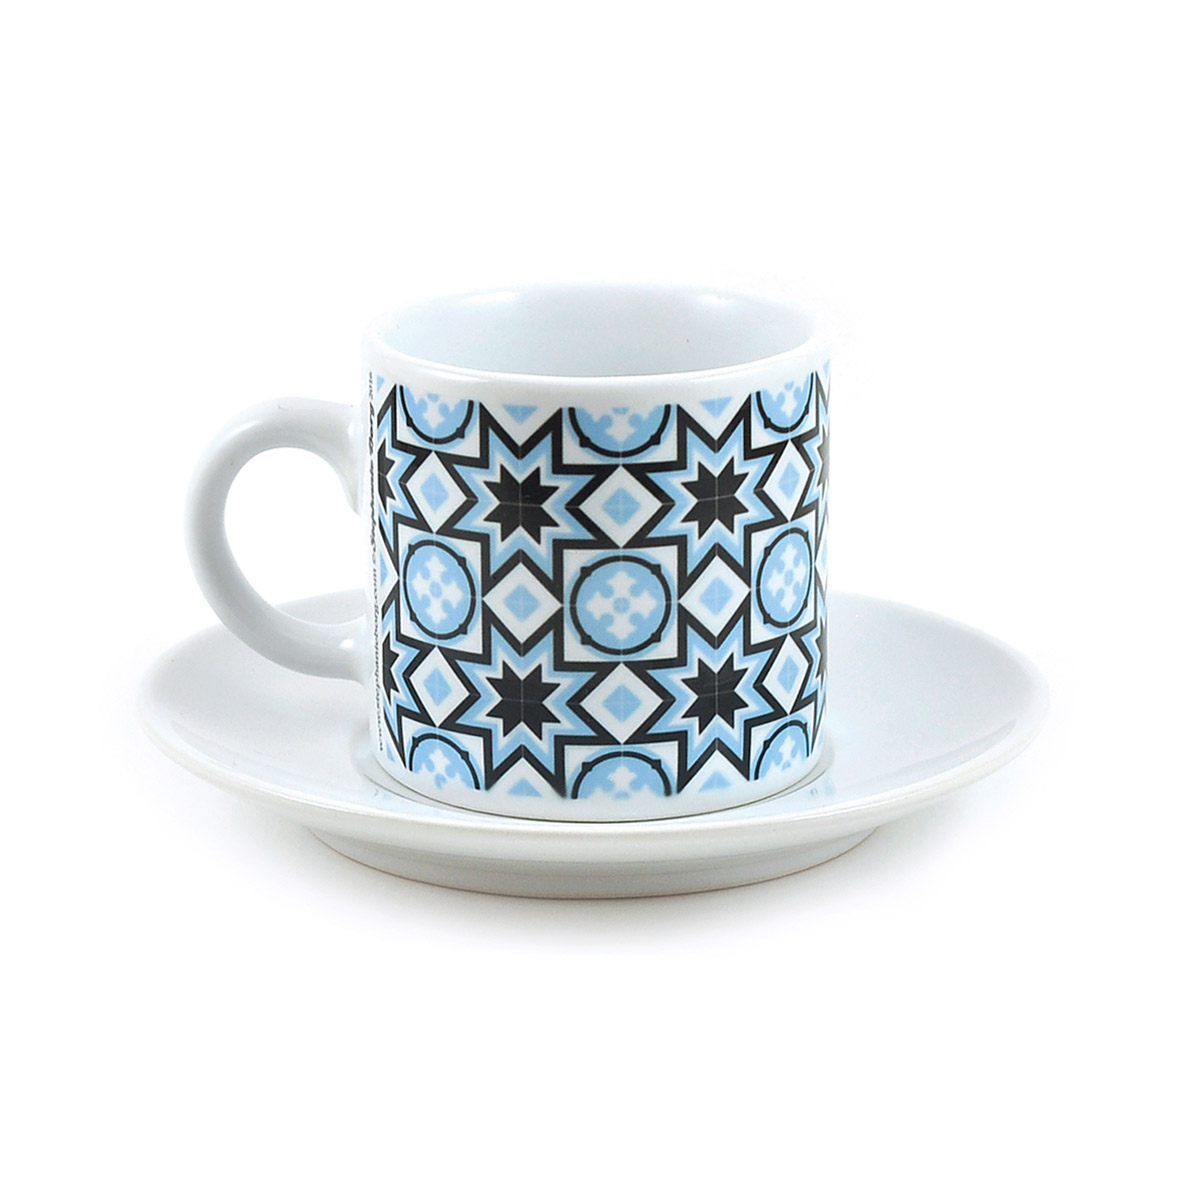 Malta Tile Espresso Cup & Saucer, pattern no.7